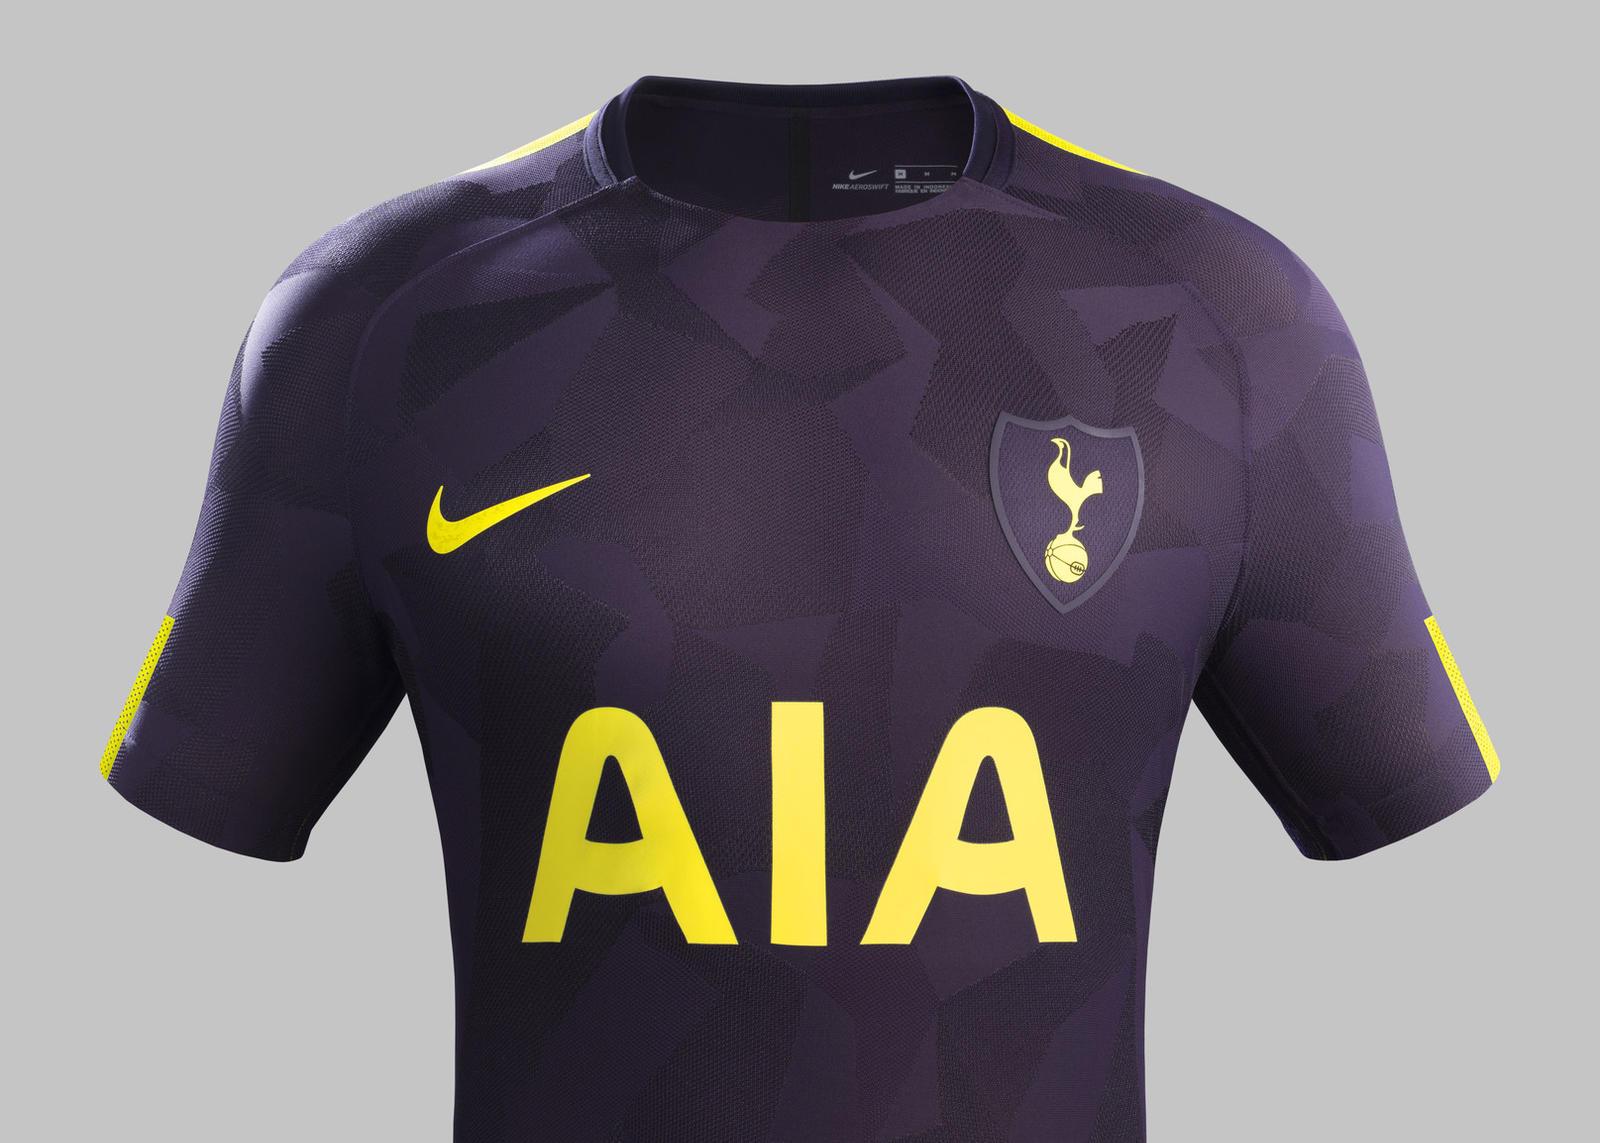 c06df31669a Tottenham Hotspur Unveils Dazzle Camo Third Kit - Nike News